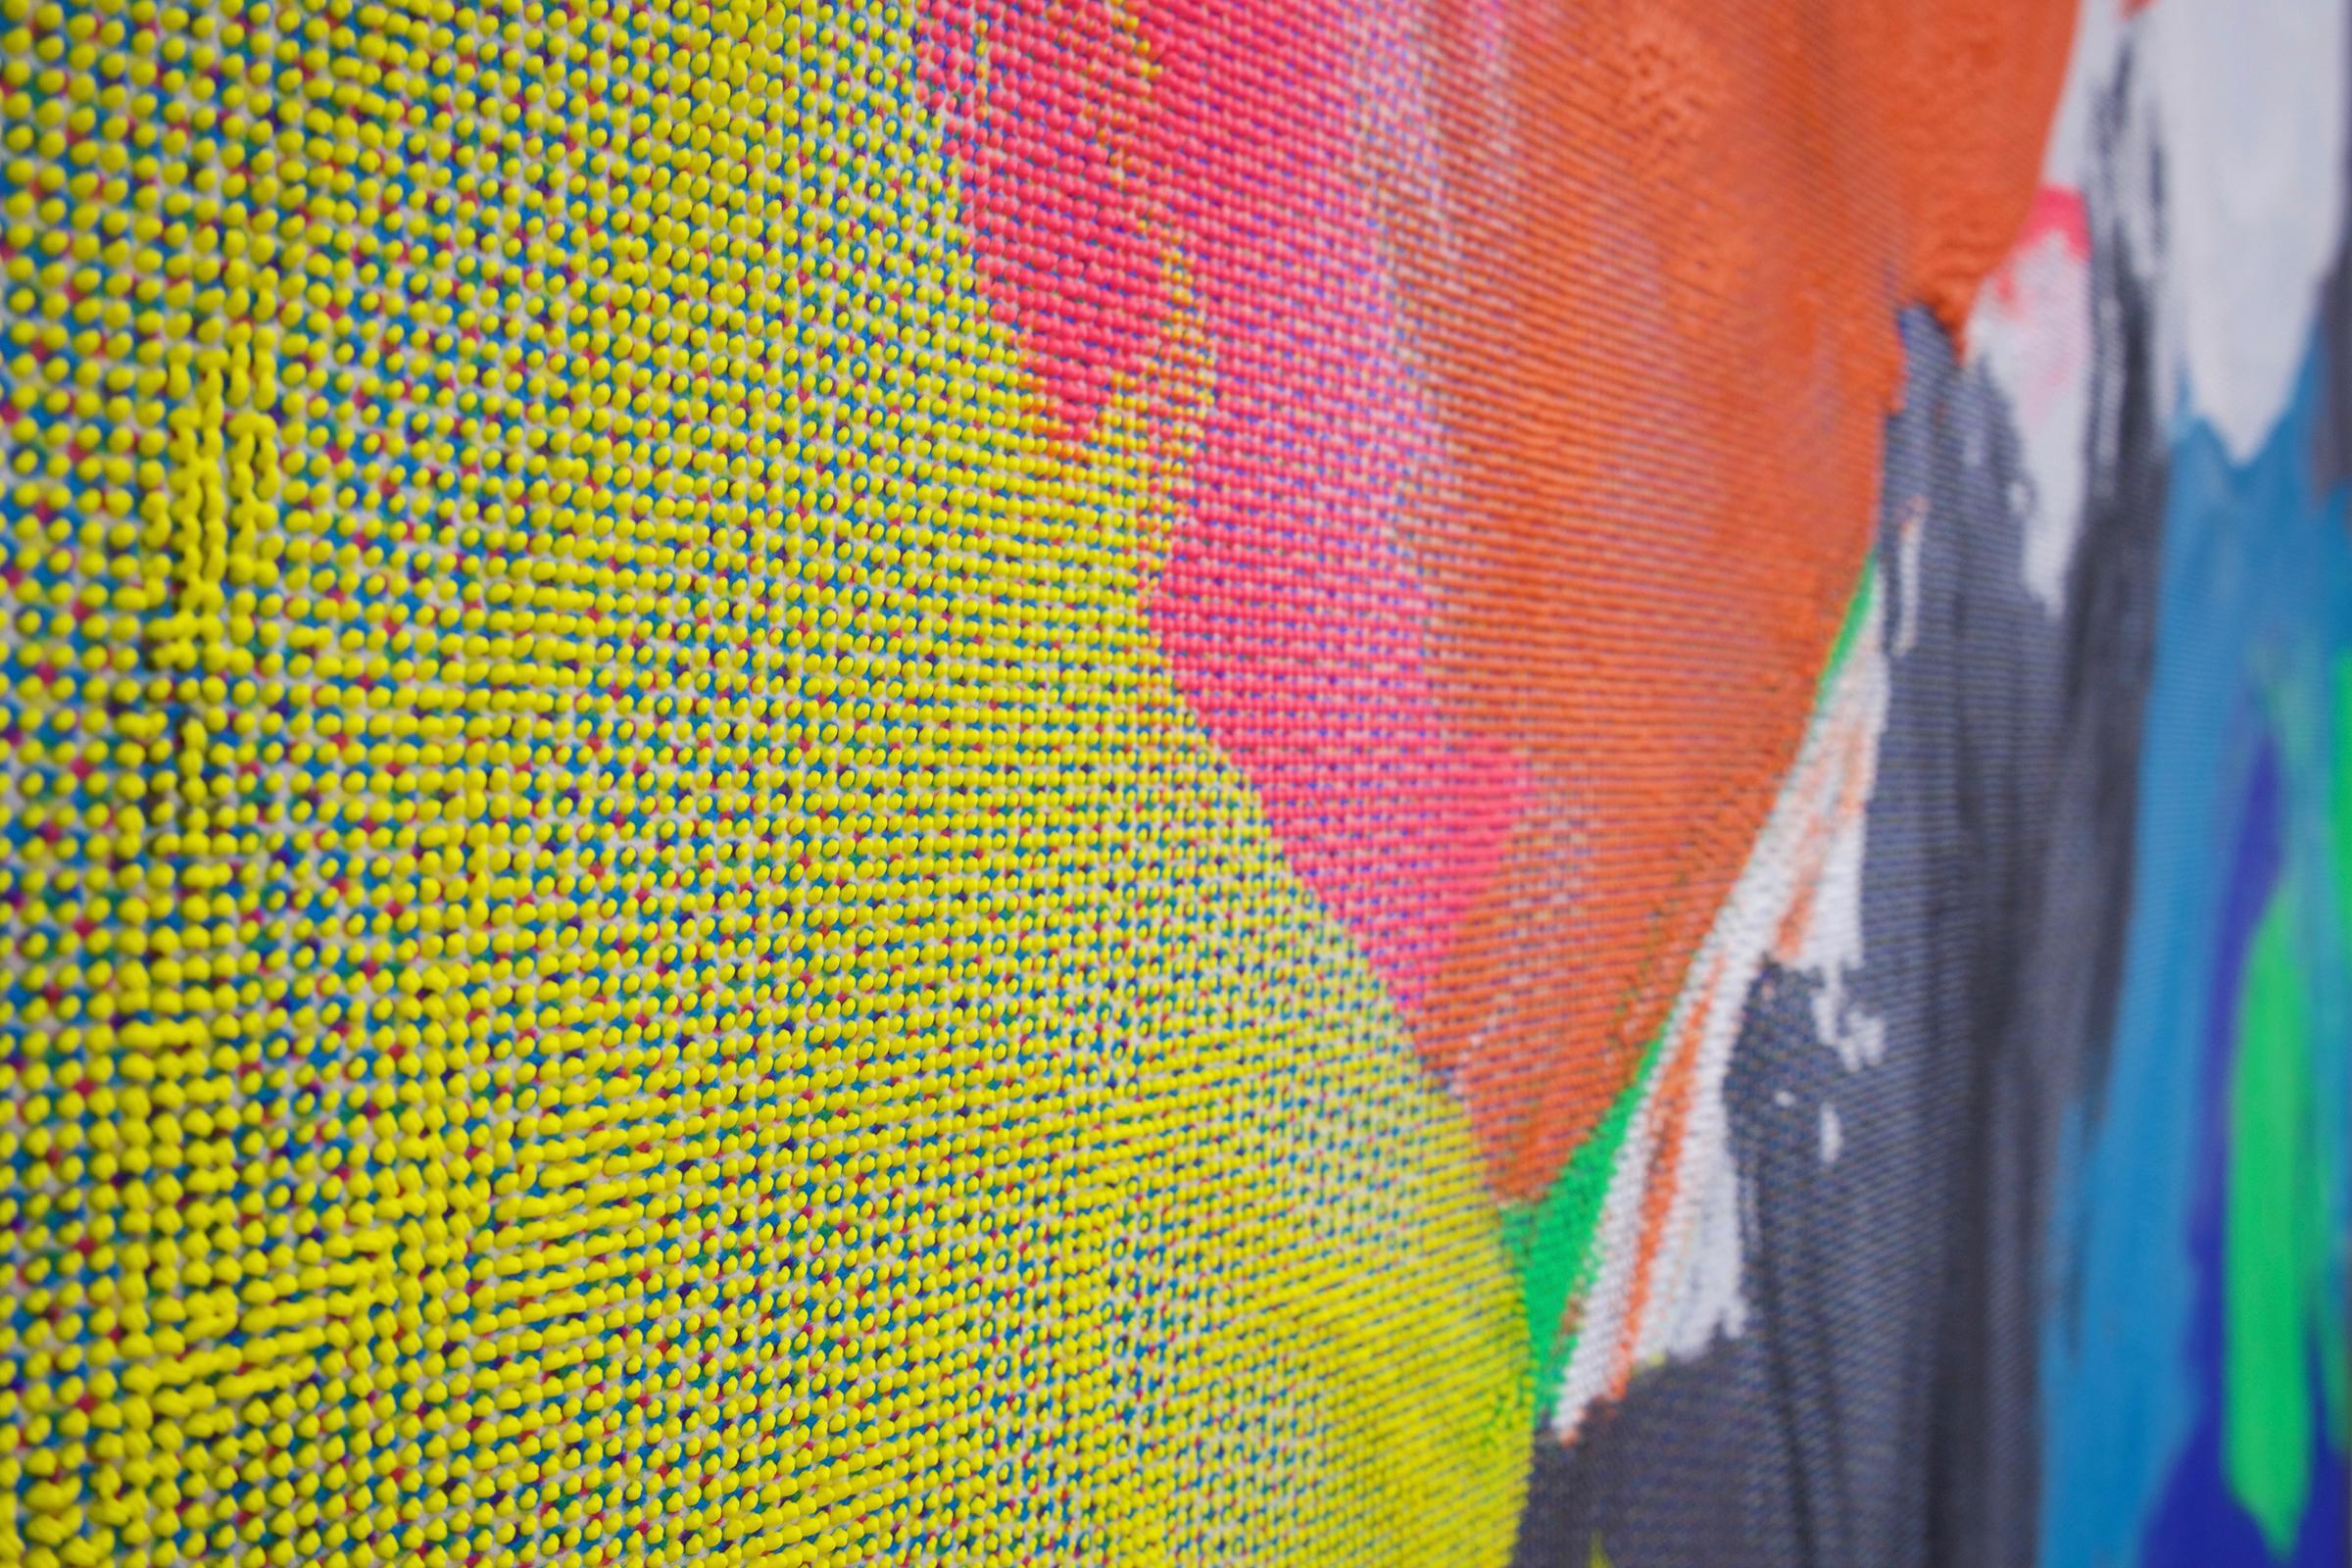 "EVAN NESBIT  (detail)  Manifold Painting (Tactile Interface) , 2017, acrylic, UV curable ink on vinyl coated mesh fabric, 53"" x 37"""